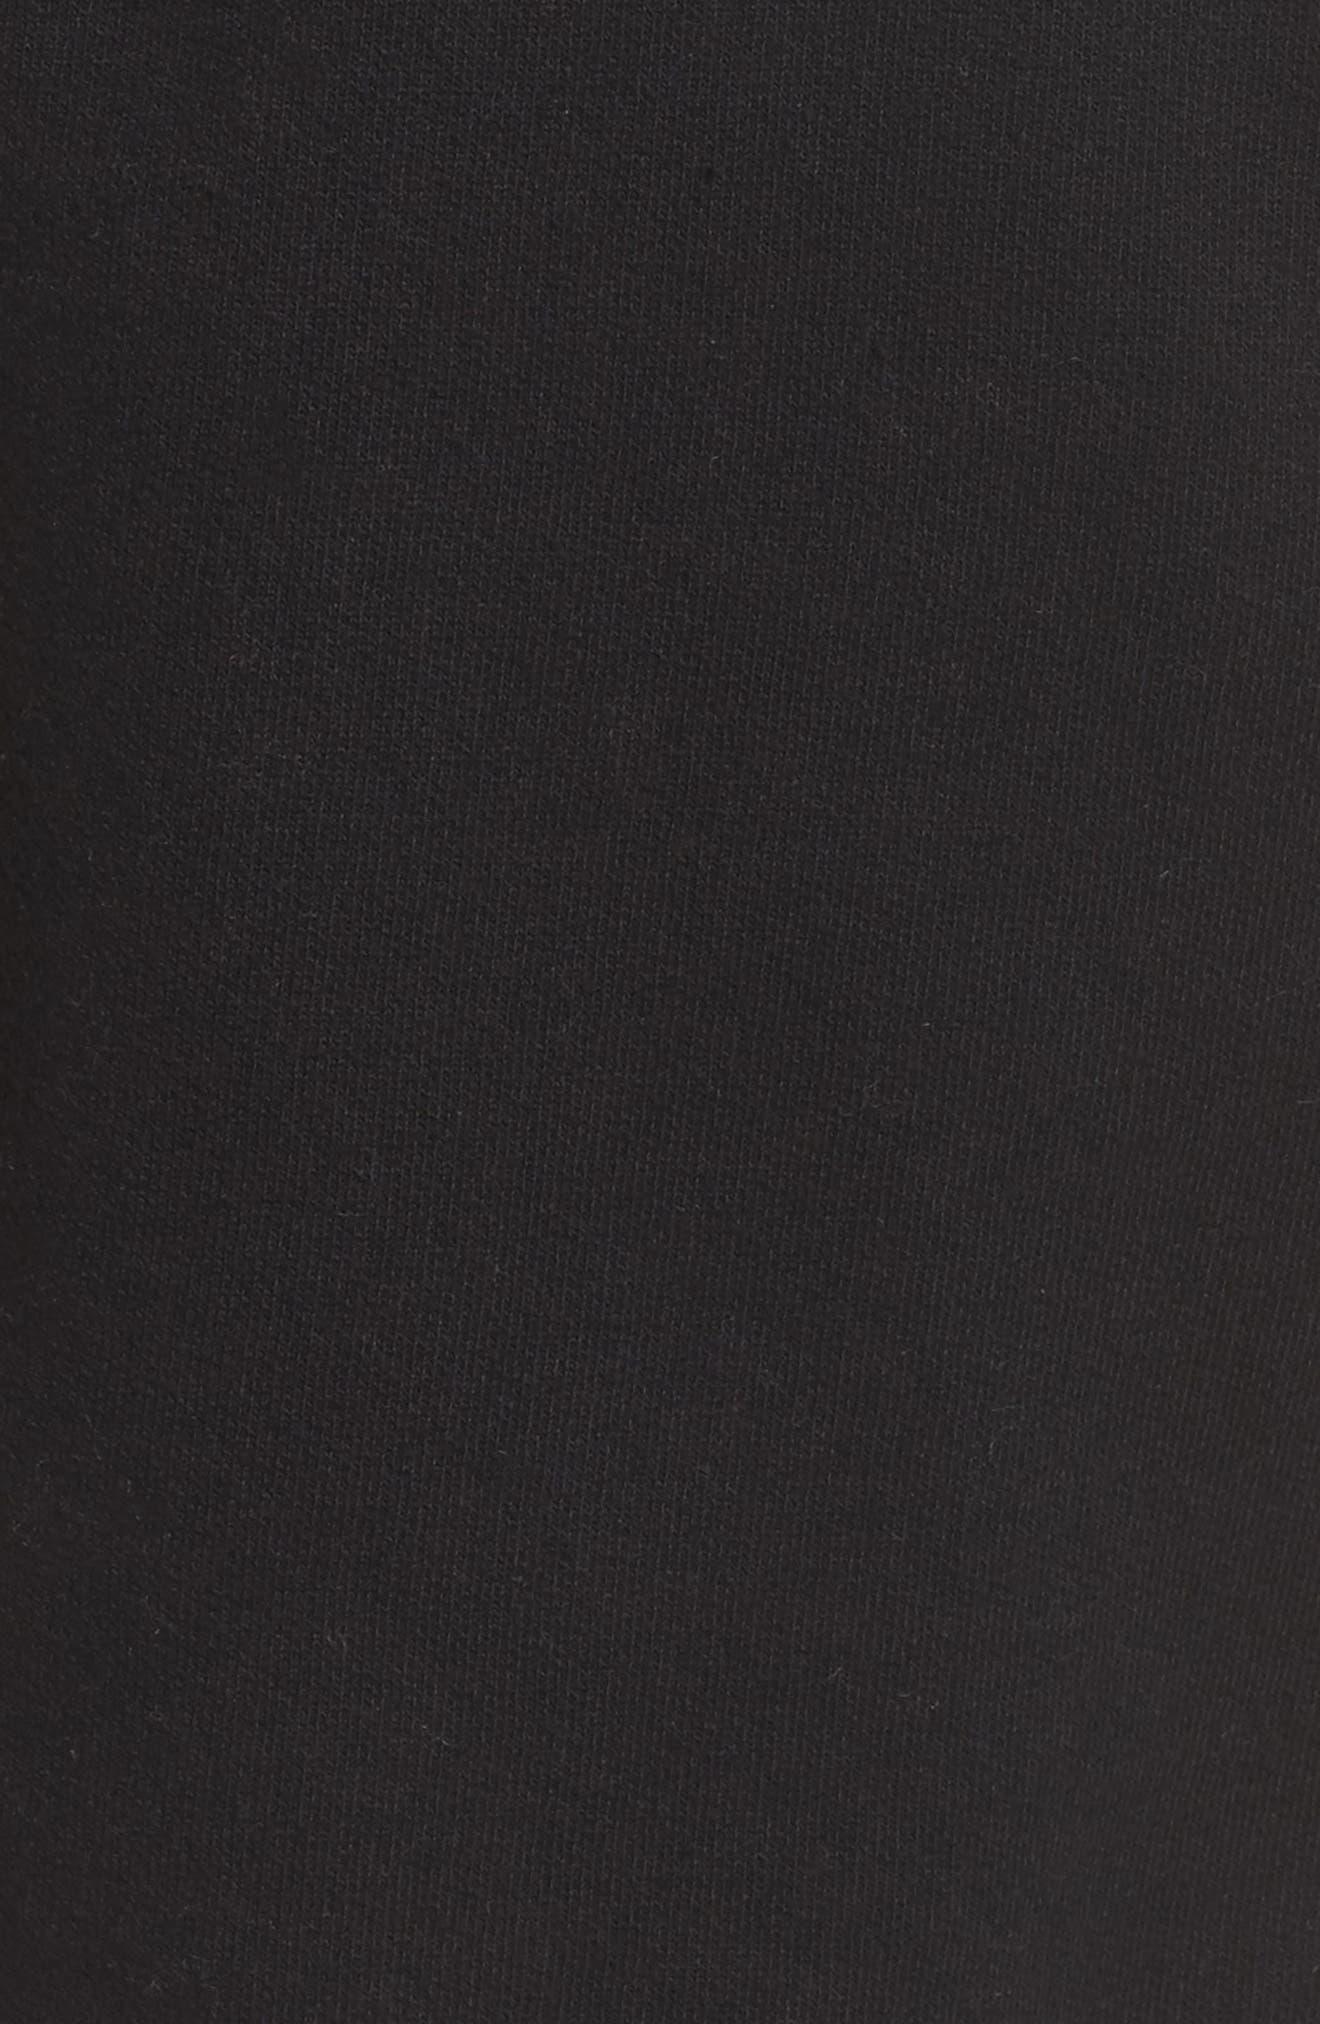 Brunette Shorts,                             Alternate thumbnail 7, color,                             Black